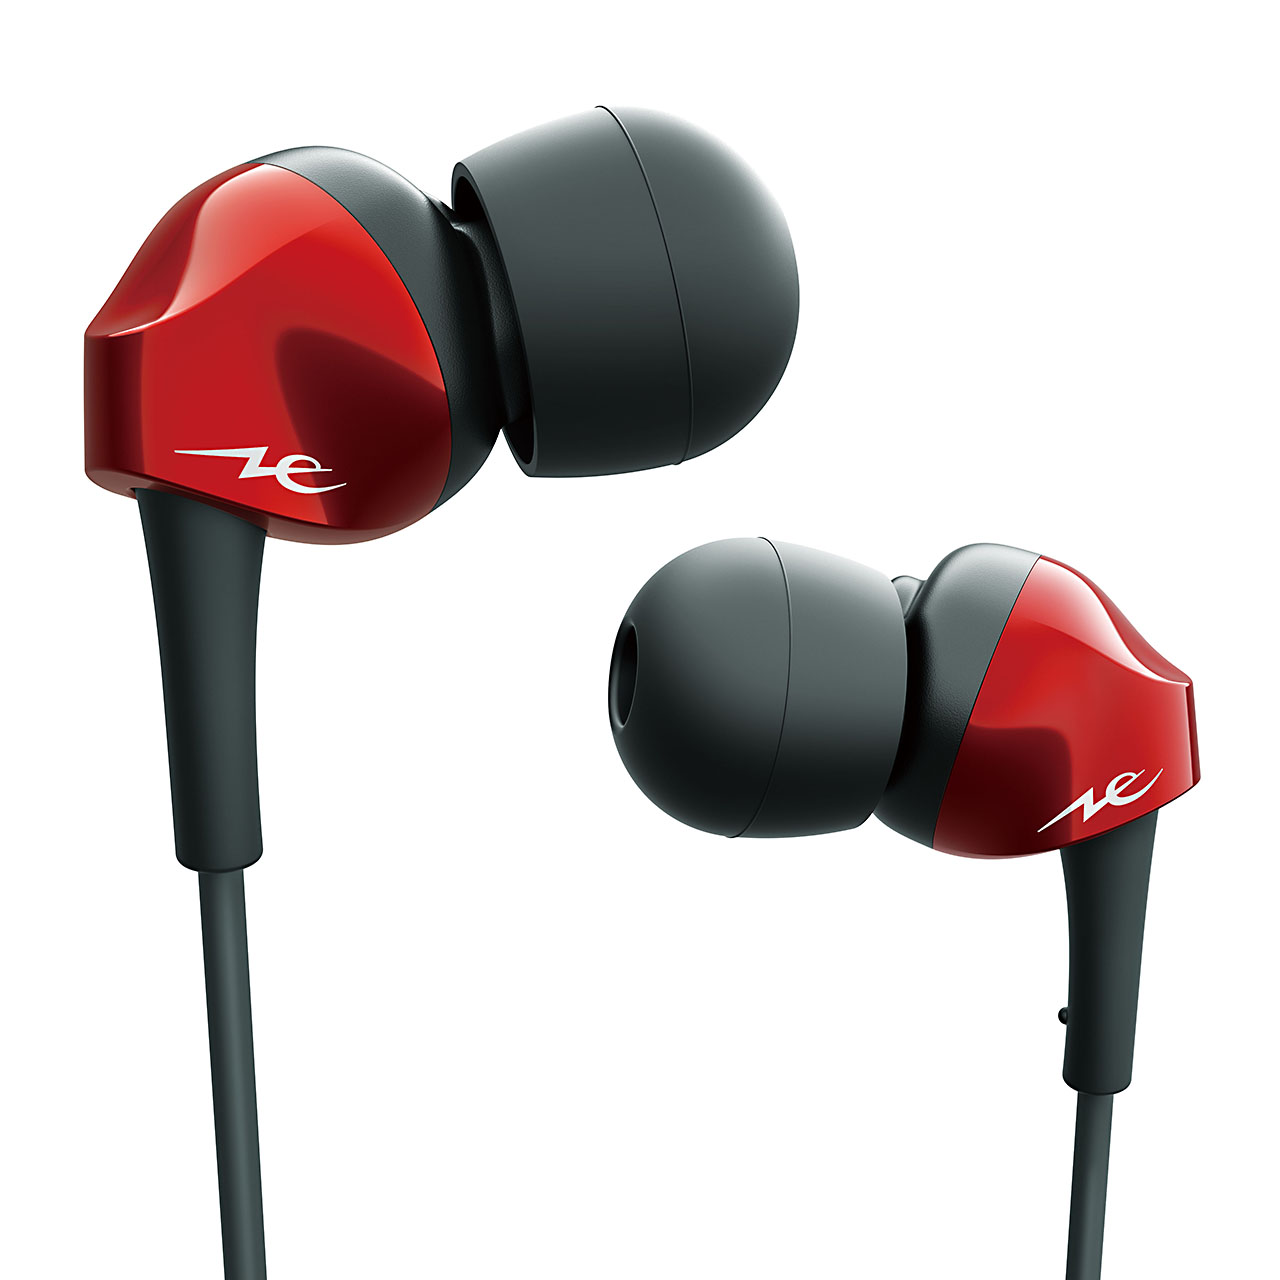 HP-N200BT 高音質Bluetoothイヤホン Pure Standard Wireless Series 「EXTRA Clear」